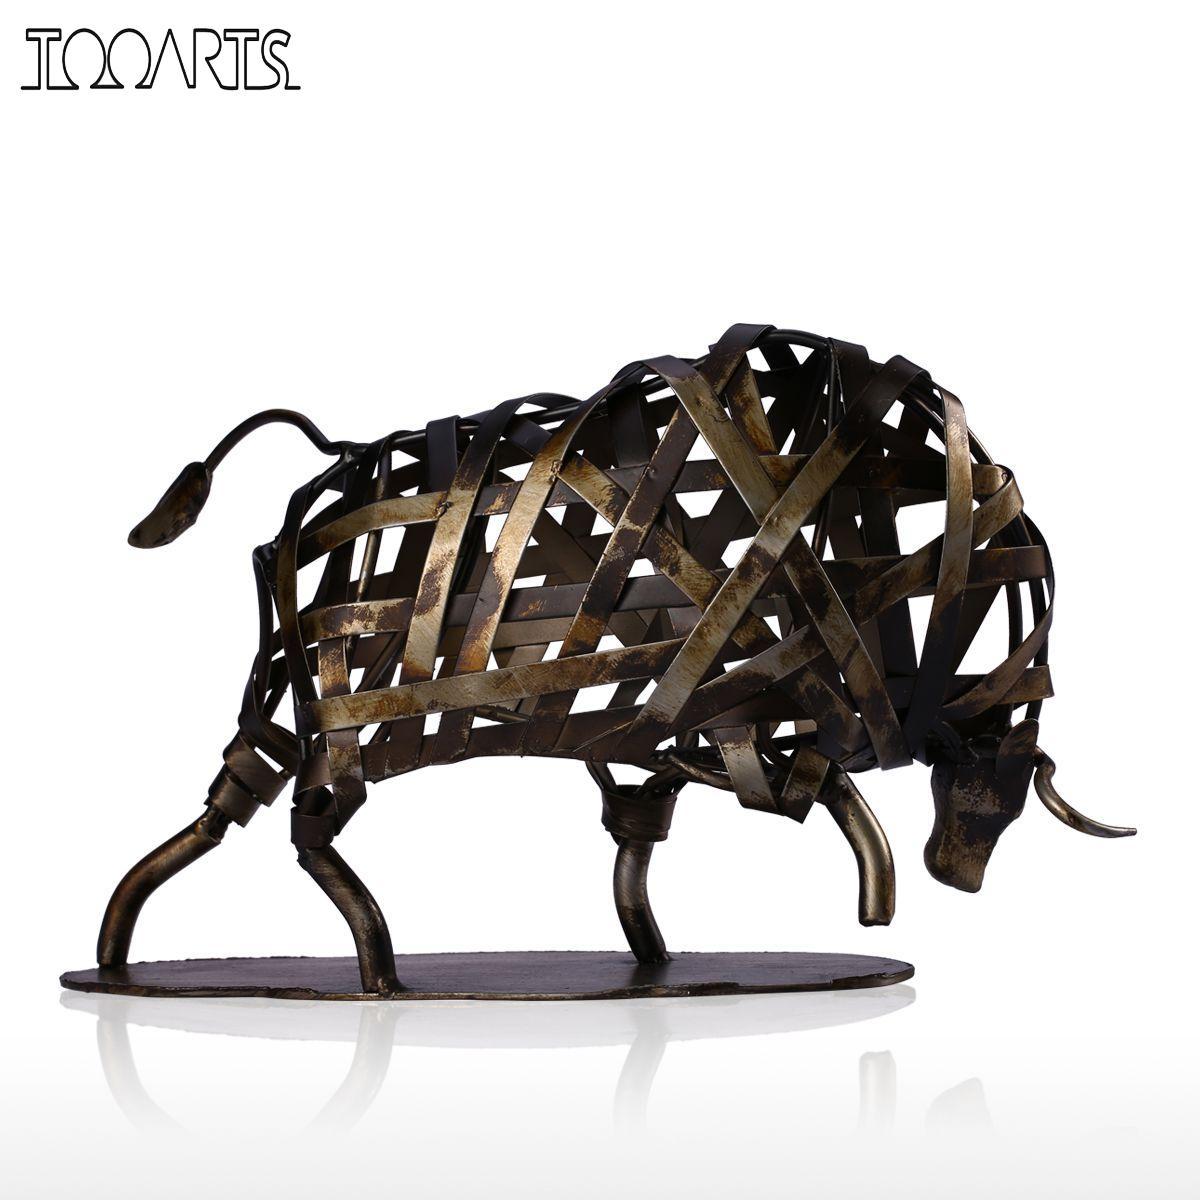 Tooarts Metal Animal Figurine Iron Braided Cattle Vintage Home Decor Handmade Animal Crafts Accessories Gift Bull Sculpture